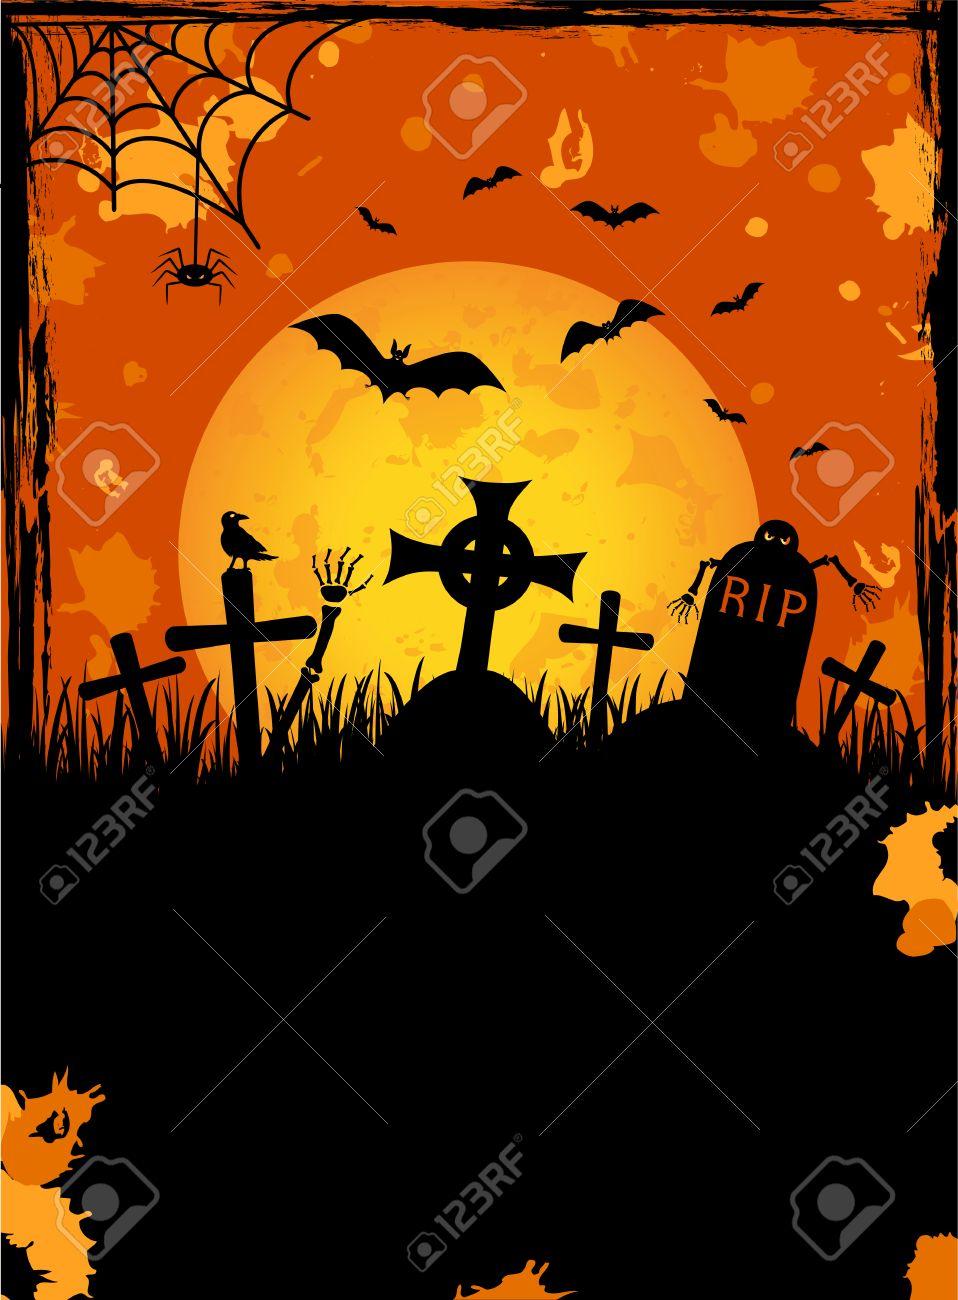 Grunge Halloween night background, illustration Stock Vector - 7929878